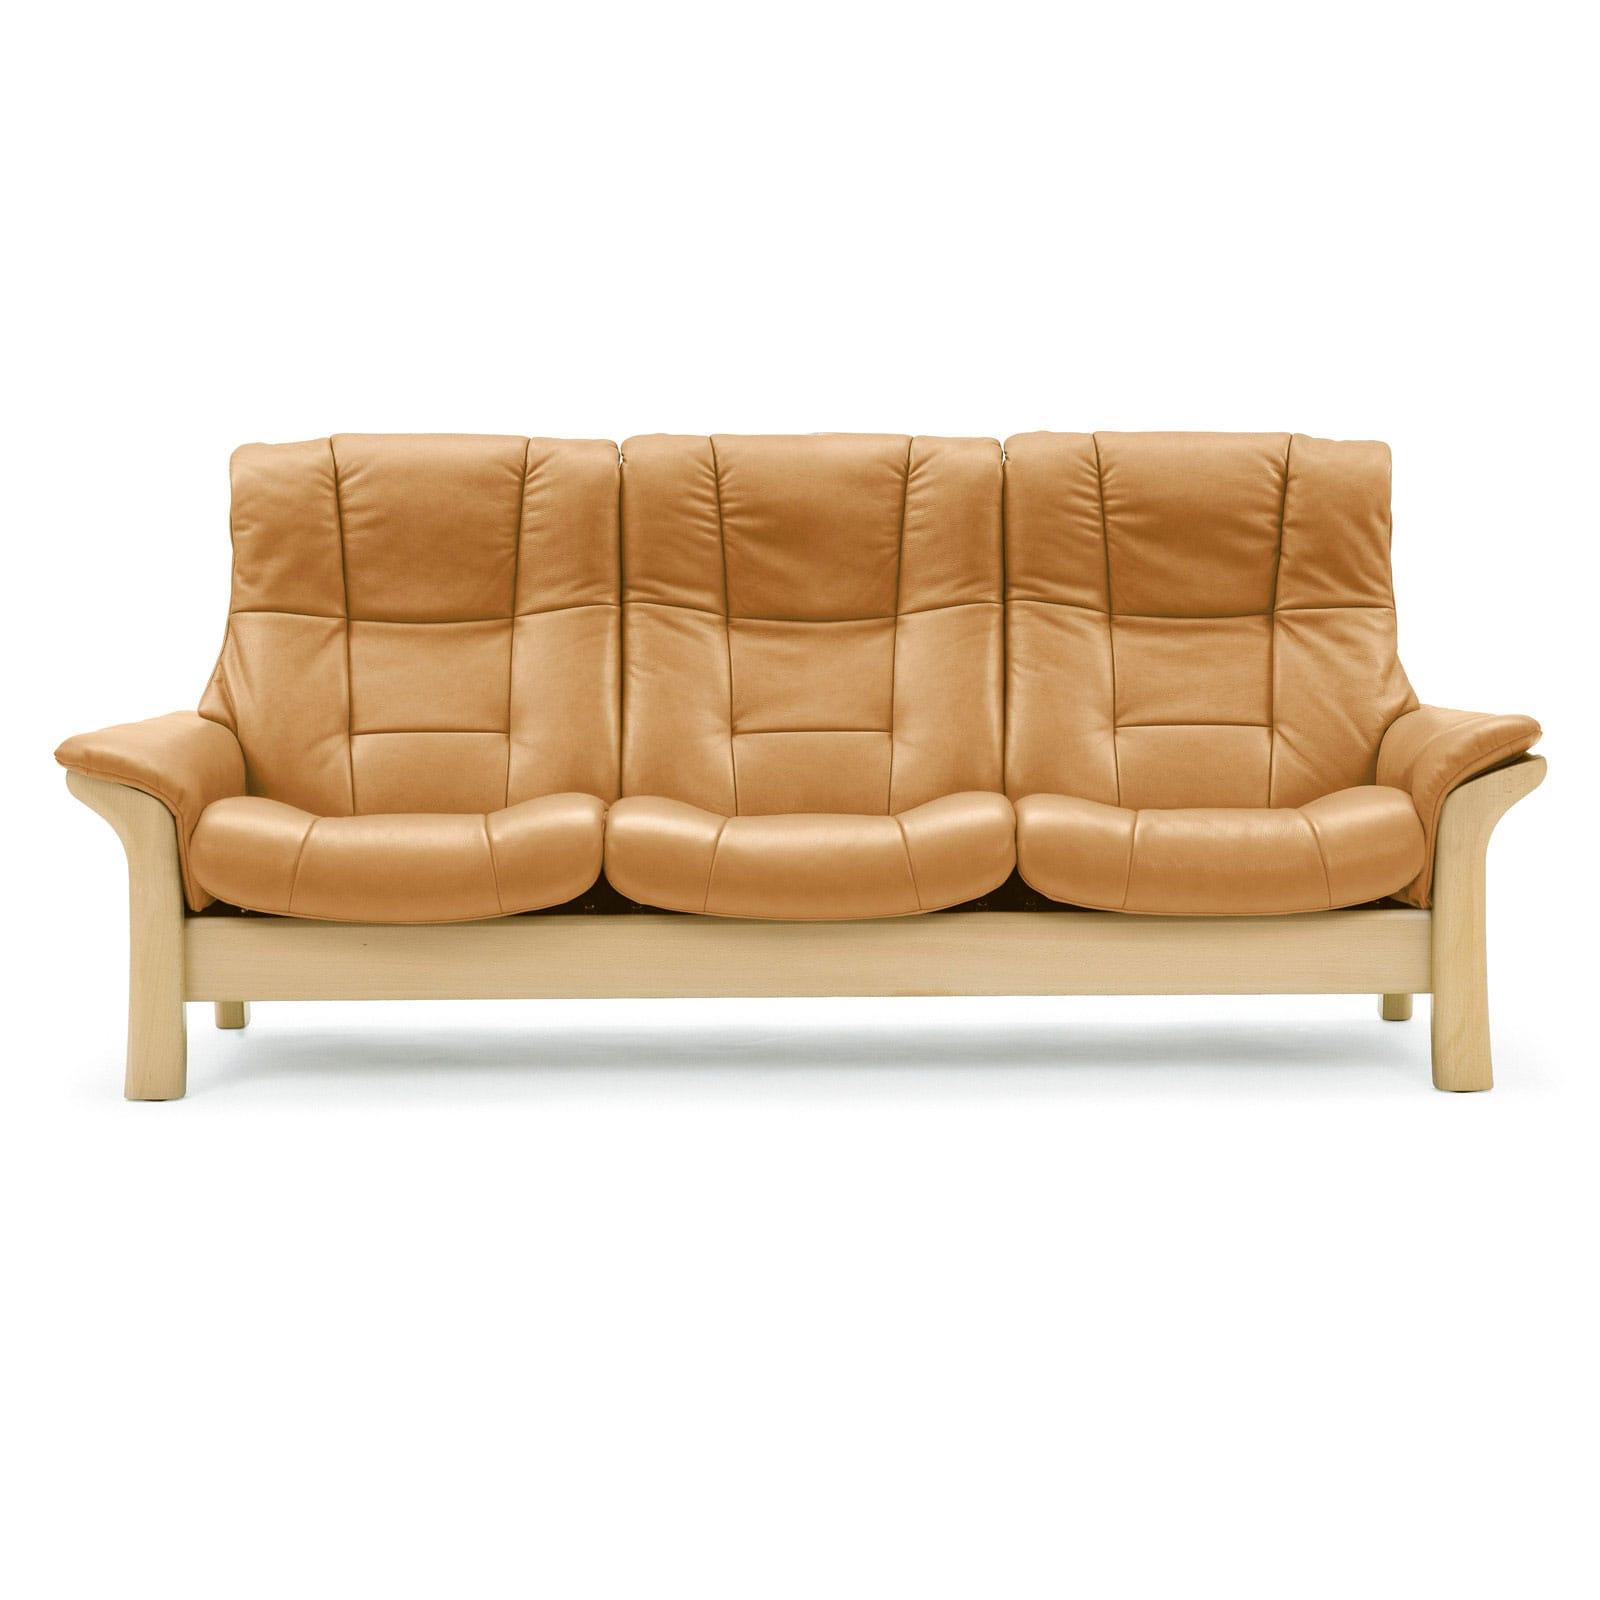 Full Size of 3 Sitzer Sofa Mit Schlaffunktion Rot Leder Ikea Nockeby Und Bettkasten Federkern Klippan Poco Stressless Buckingham L Hoch Tan Natur Gelb Megapol Regal 30 Cm Sofa 3 Sitzer Sofa